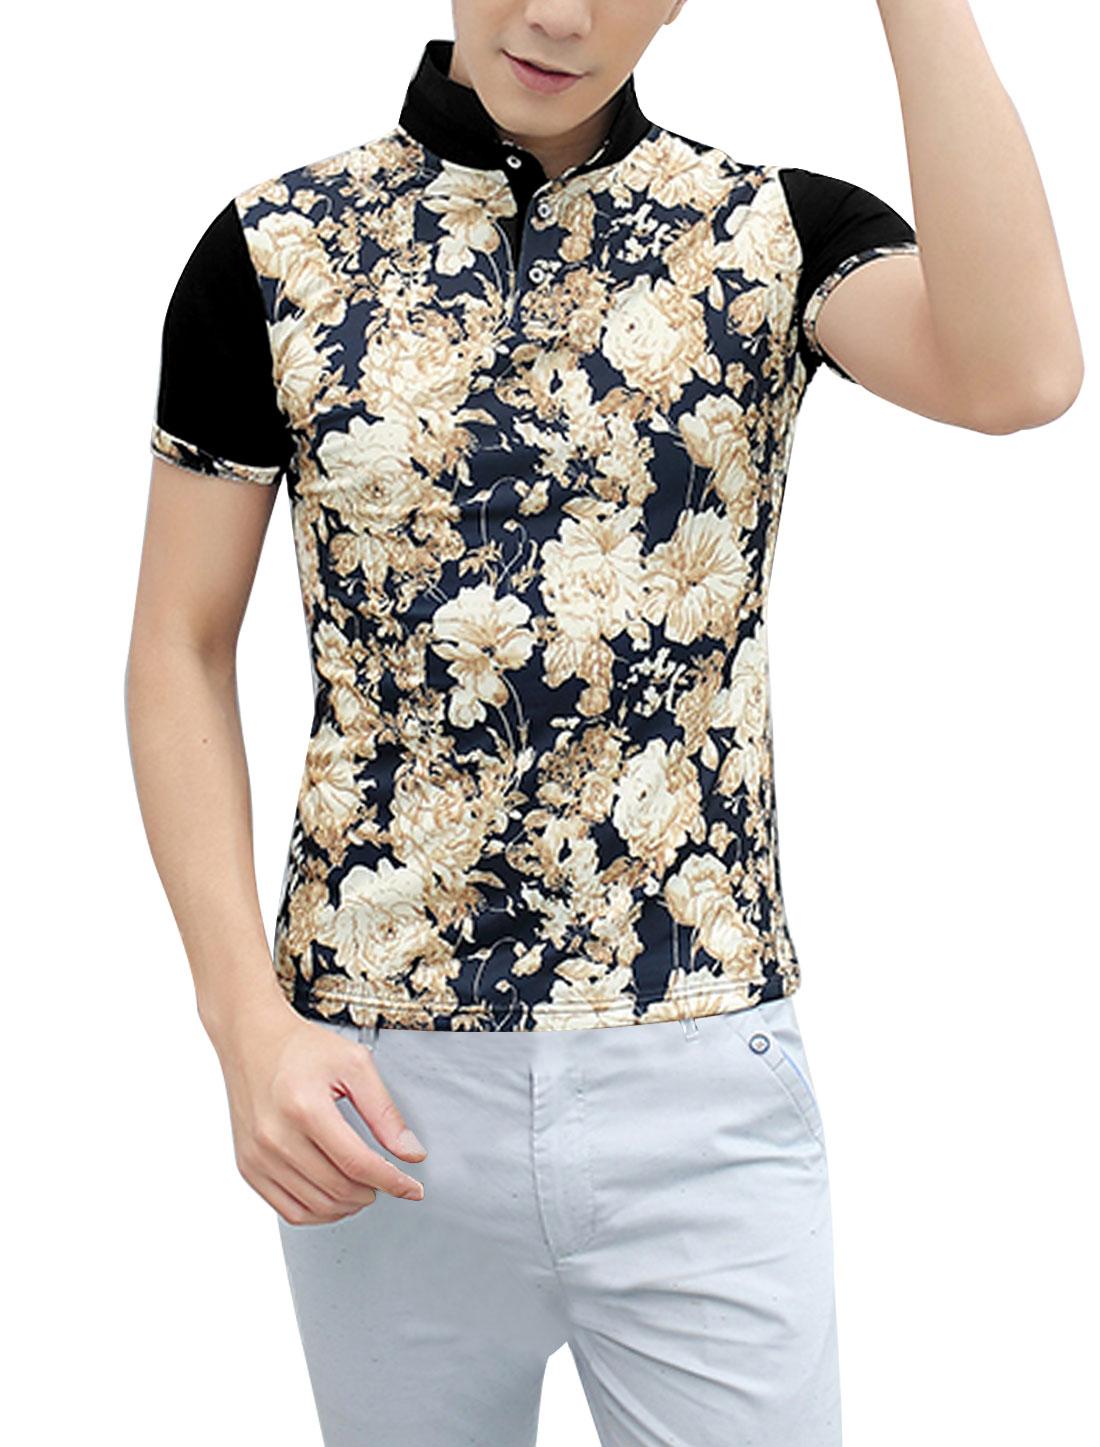 Men Three Buttons Closure Floral Prints Cozy Fit Polo Shirt Black S